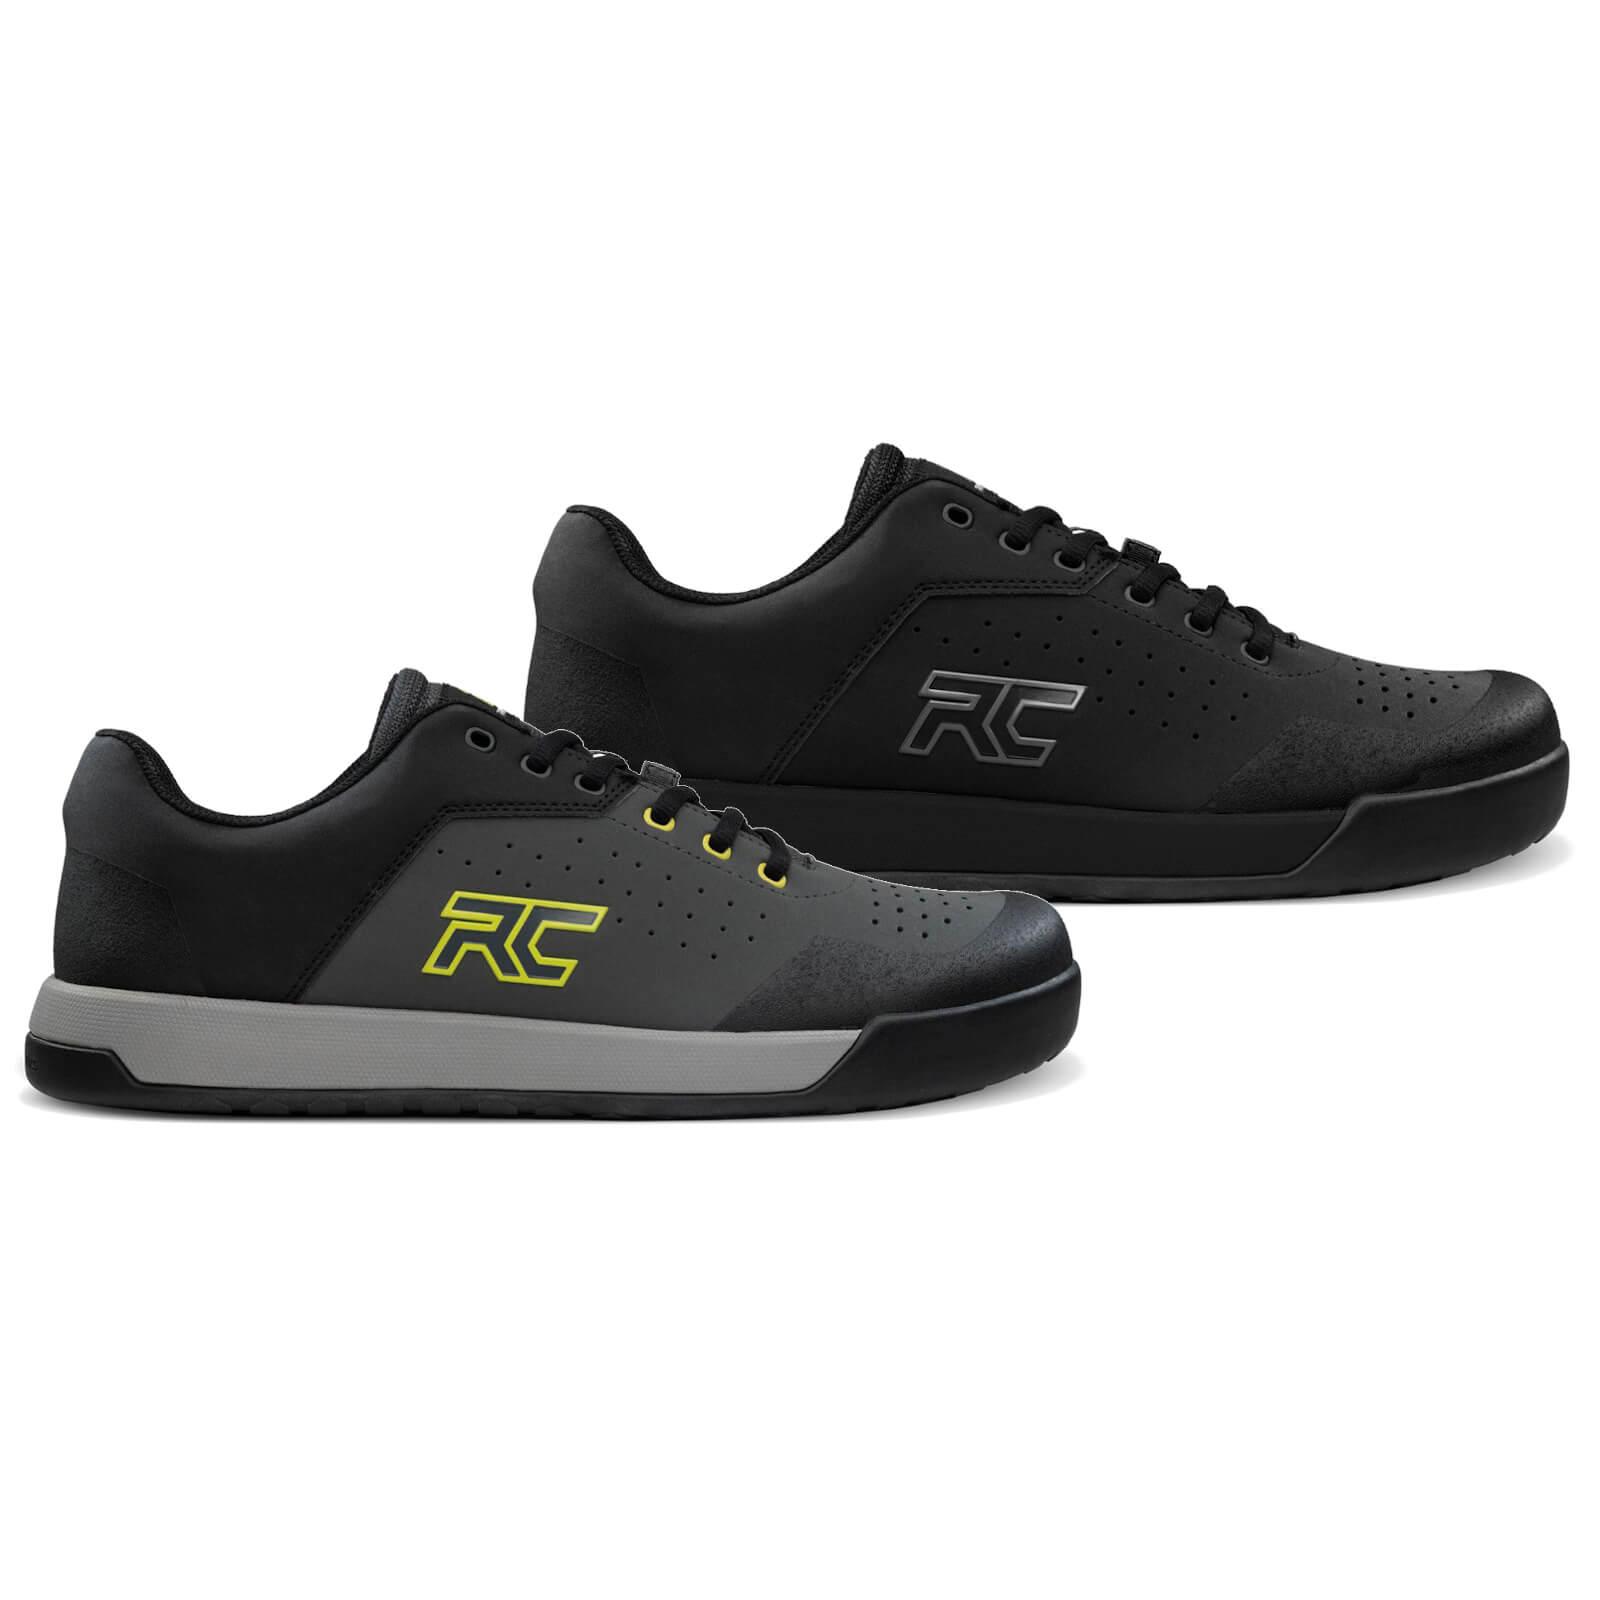 Ride Concepts Hellion Flat Mtb Shoes - Uk 11/eu 45 - Black